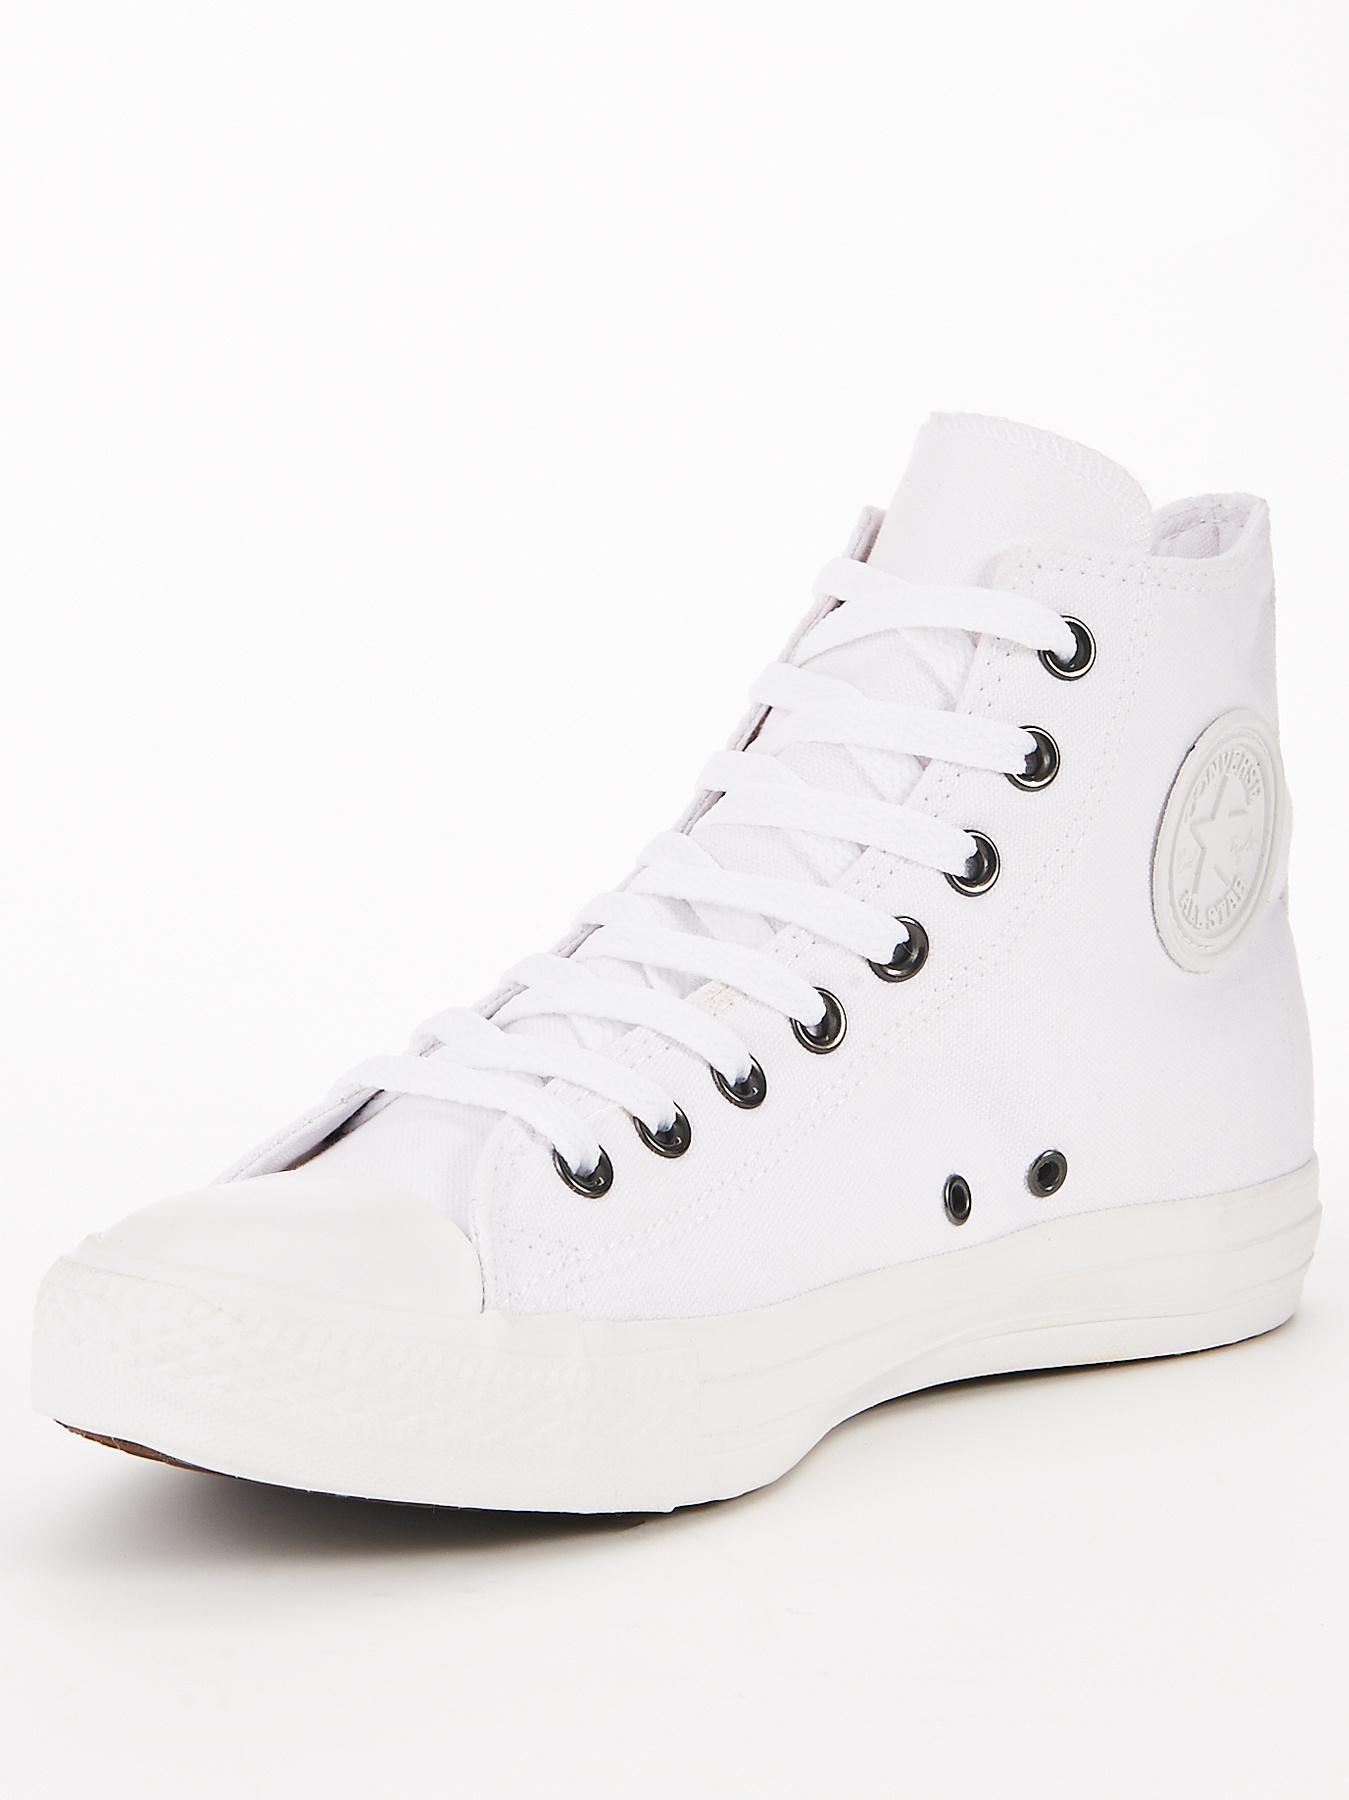 All star converse white high tops